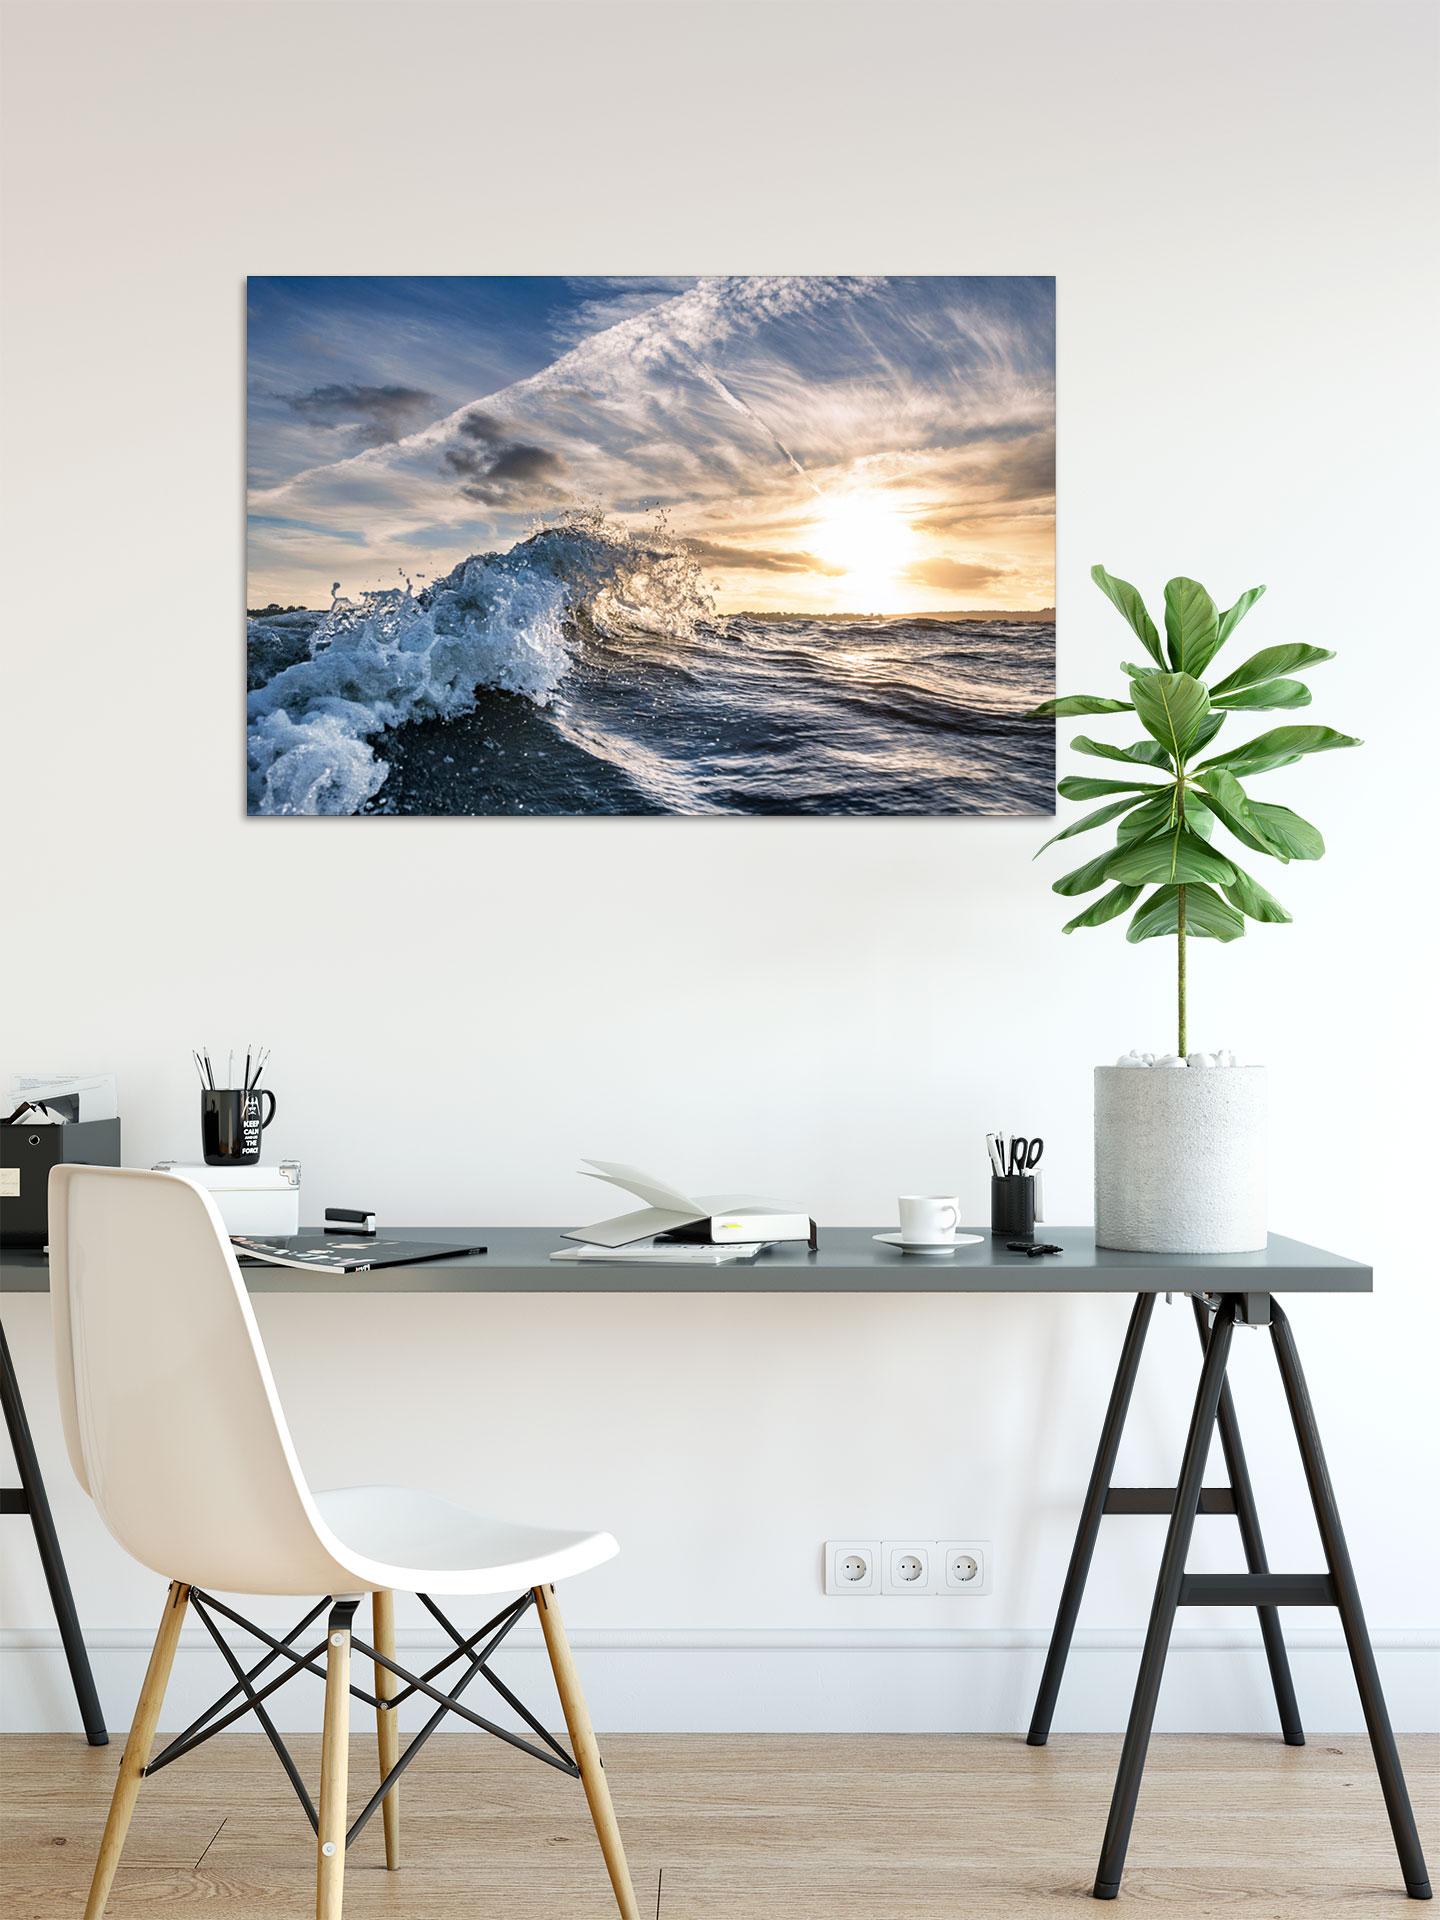 NL091-elbwelle-hamburg-wandbild-bild-auf-leinwand-acrylglas-aludibond-arbeitszimmer